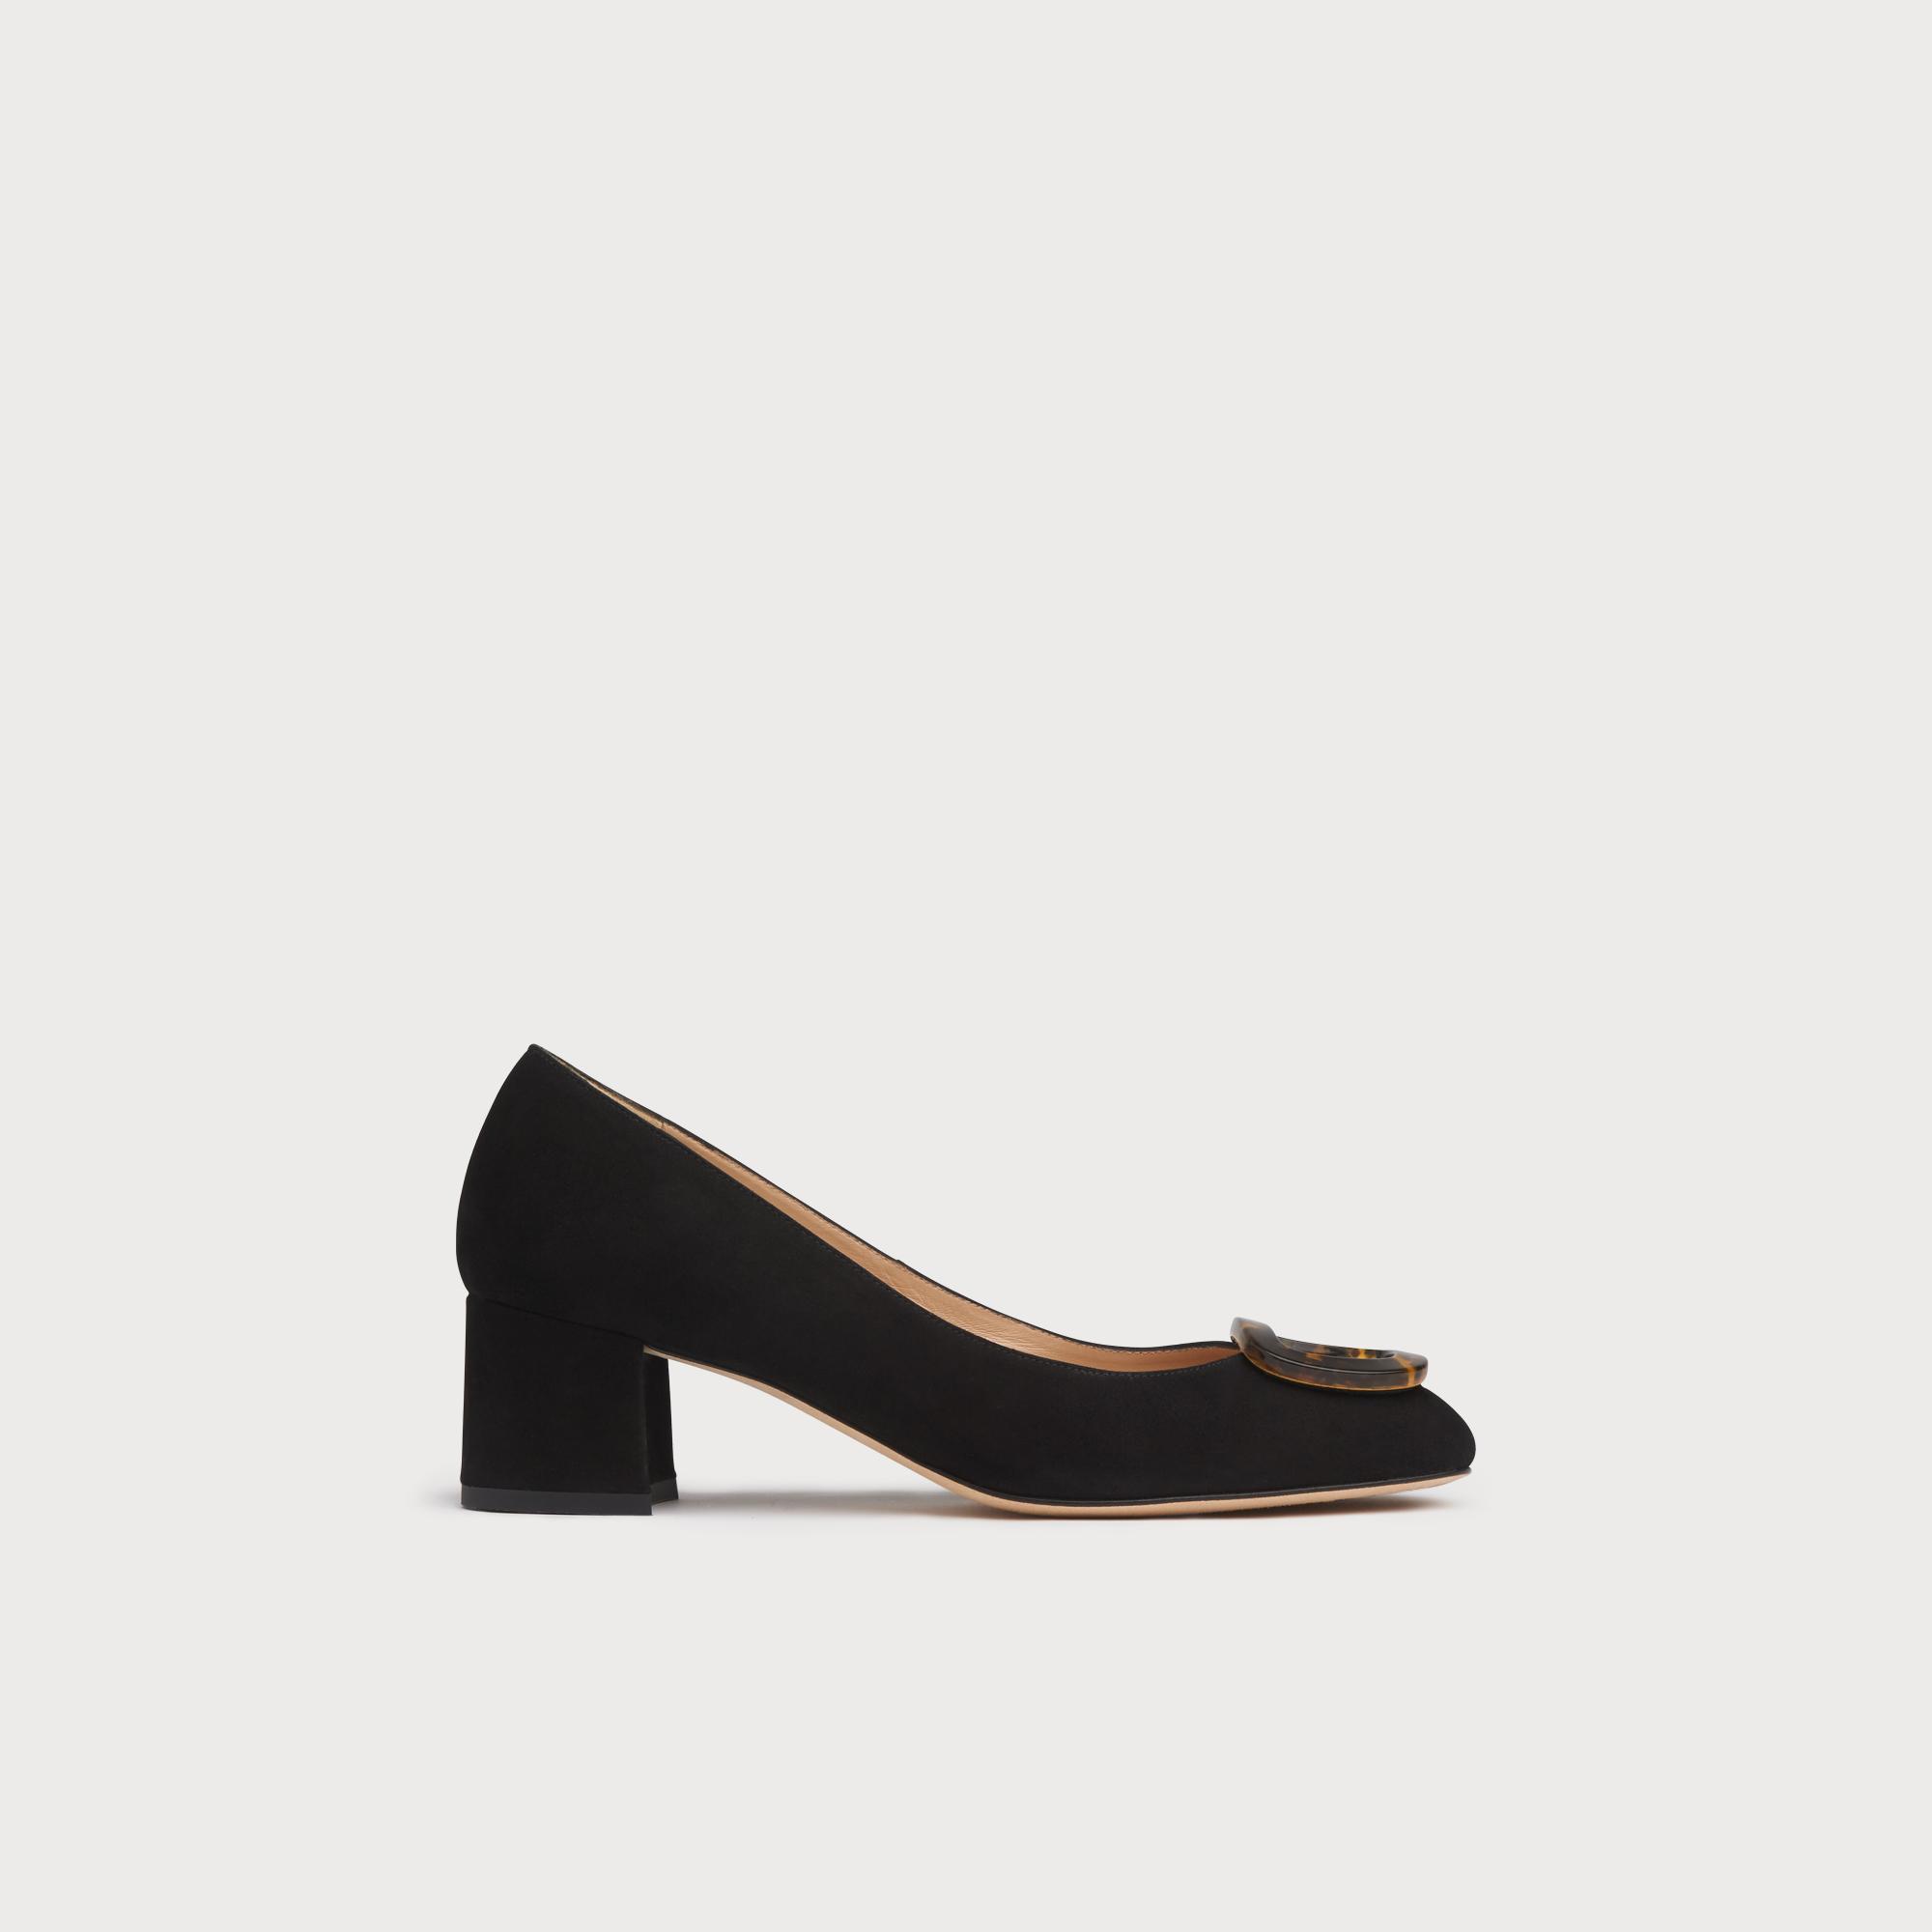 77a6254a48 Nimah Black Suede Closed Courts | Shoes | L.K.Bennett